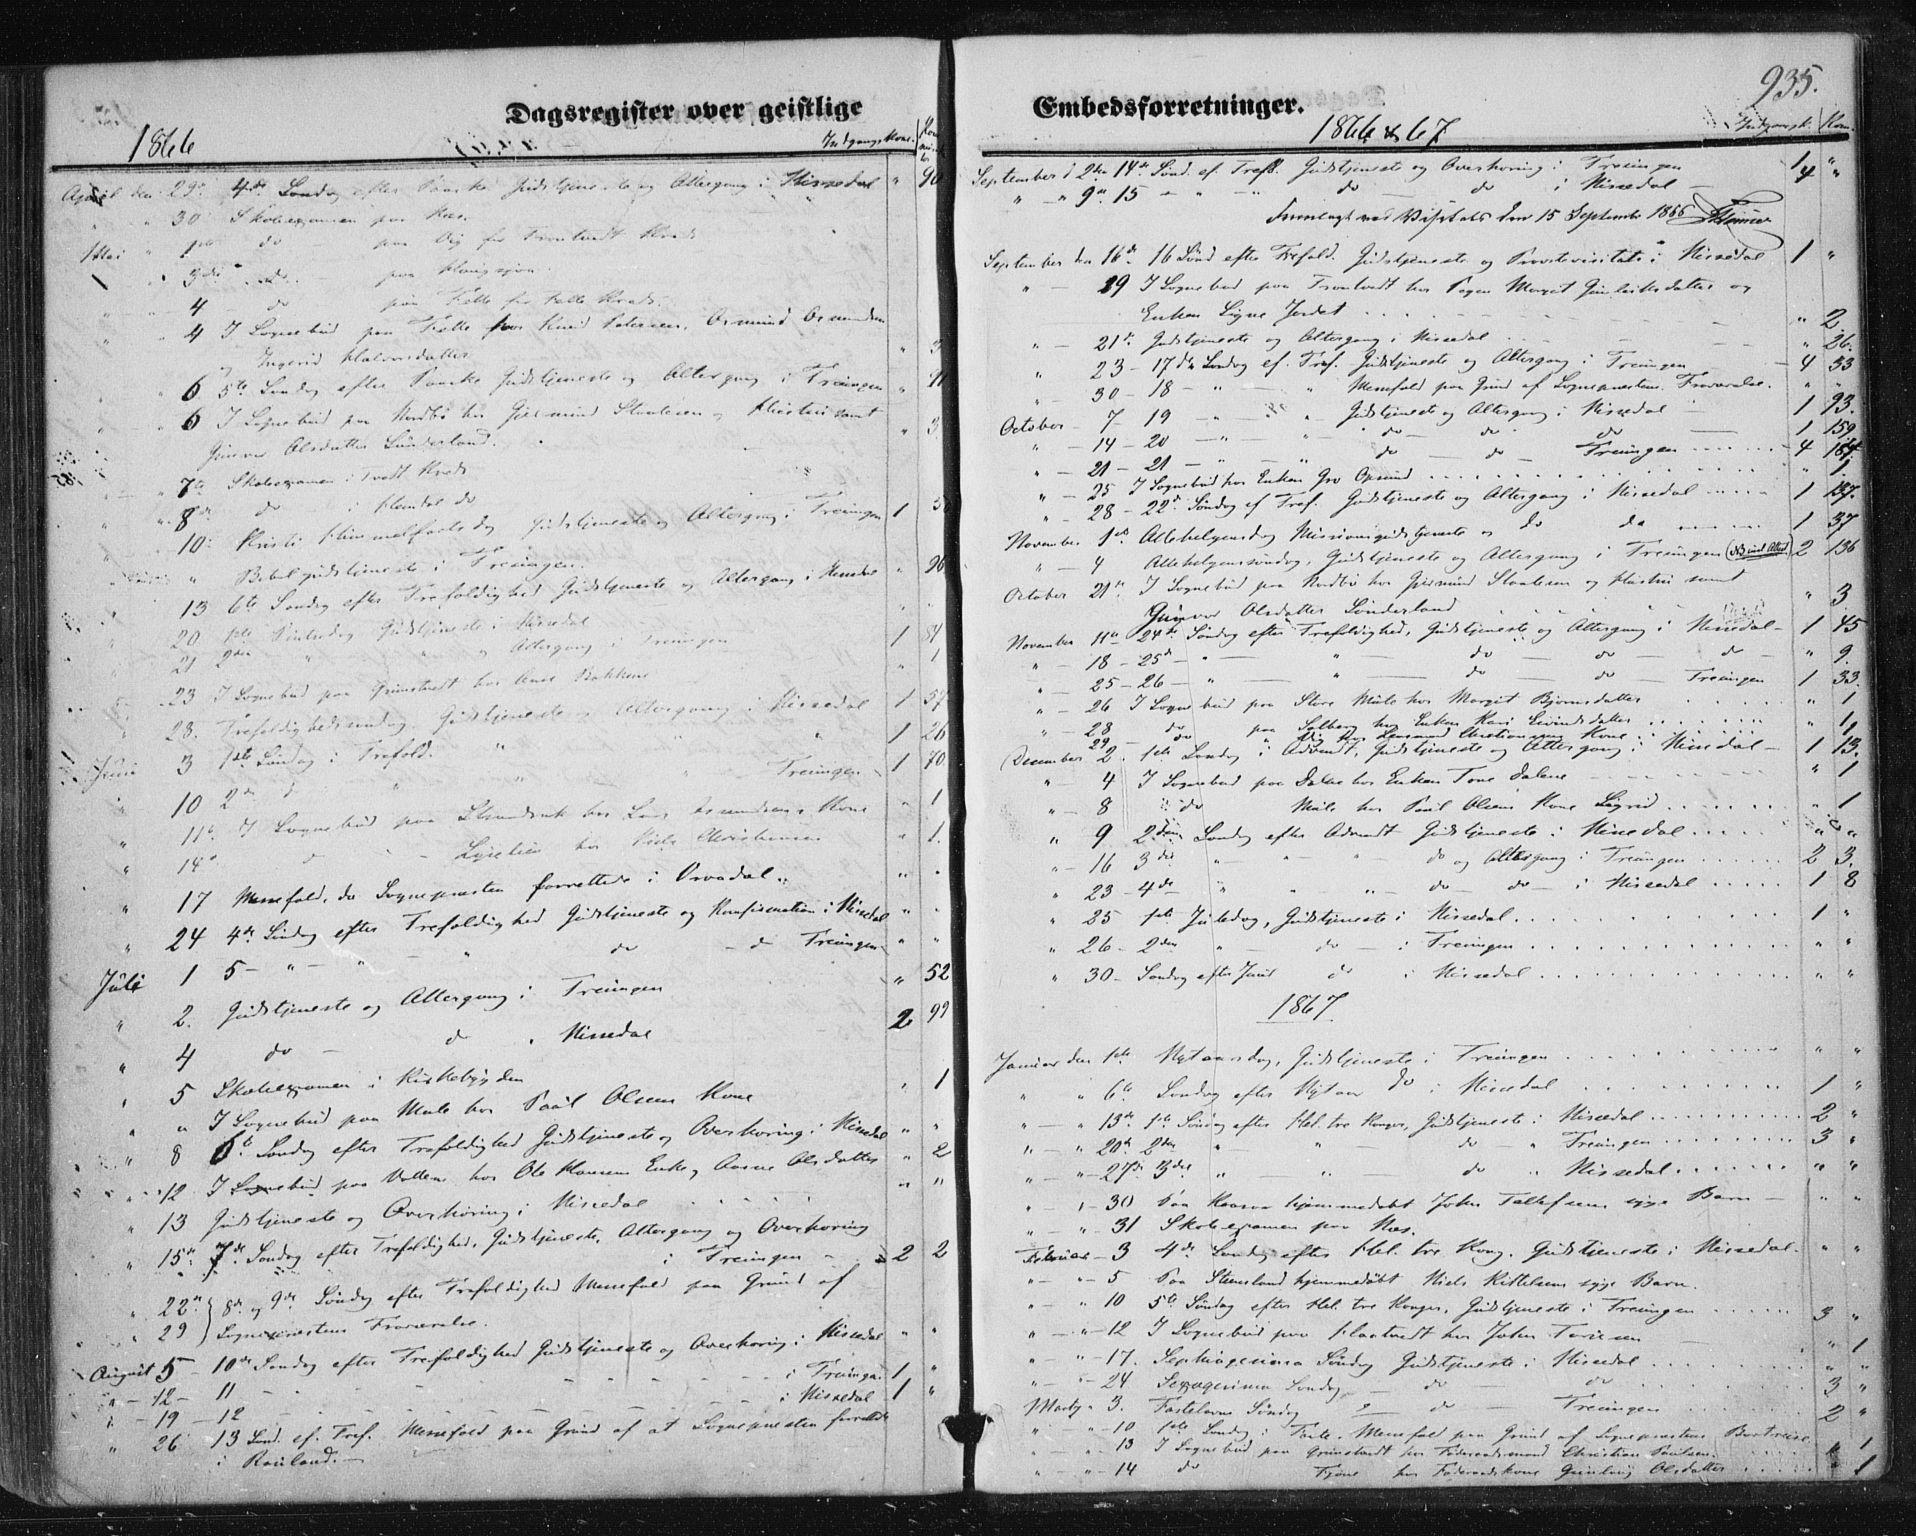 SAKO, Nissedal kirkebøker, F/Fa/L0003: Ministerialbok nr. I 3, 1846-1870, s. 934-935